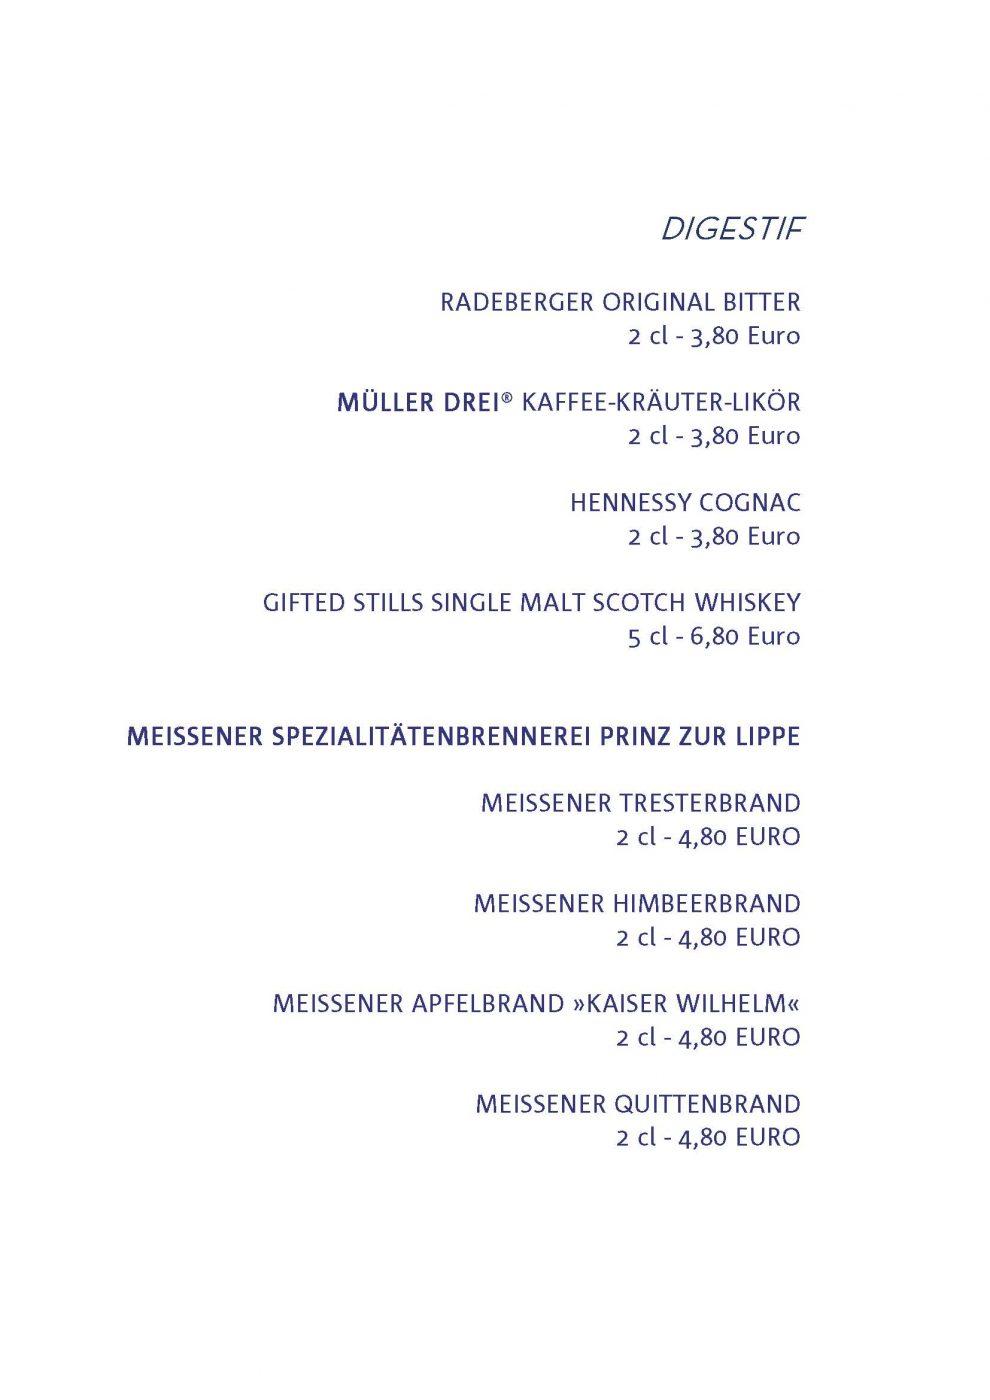 https://www.vitrum-dresden.de/wp-content/uploads/2018/08/3_AlkoholischeGetraenke_final_web_Seite_7-990x1400.jpg